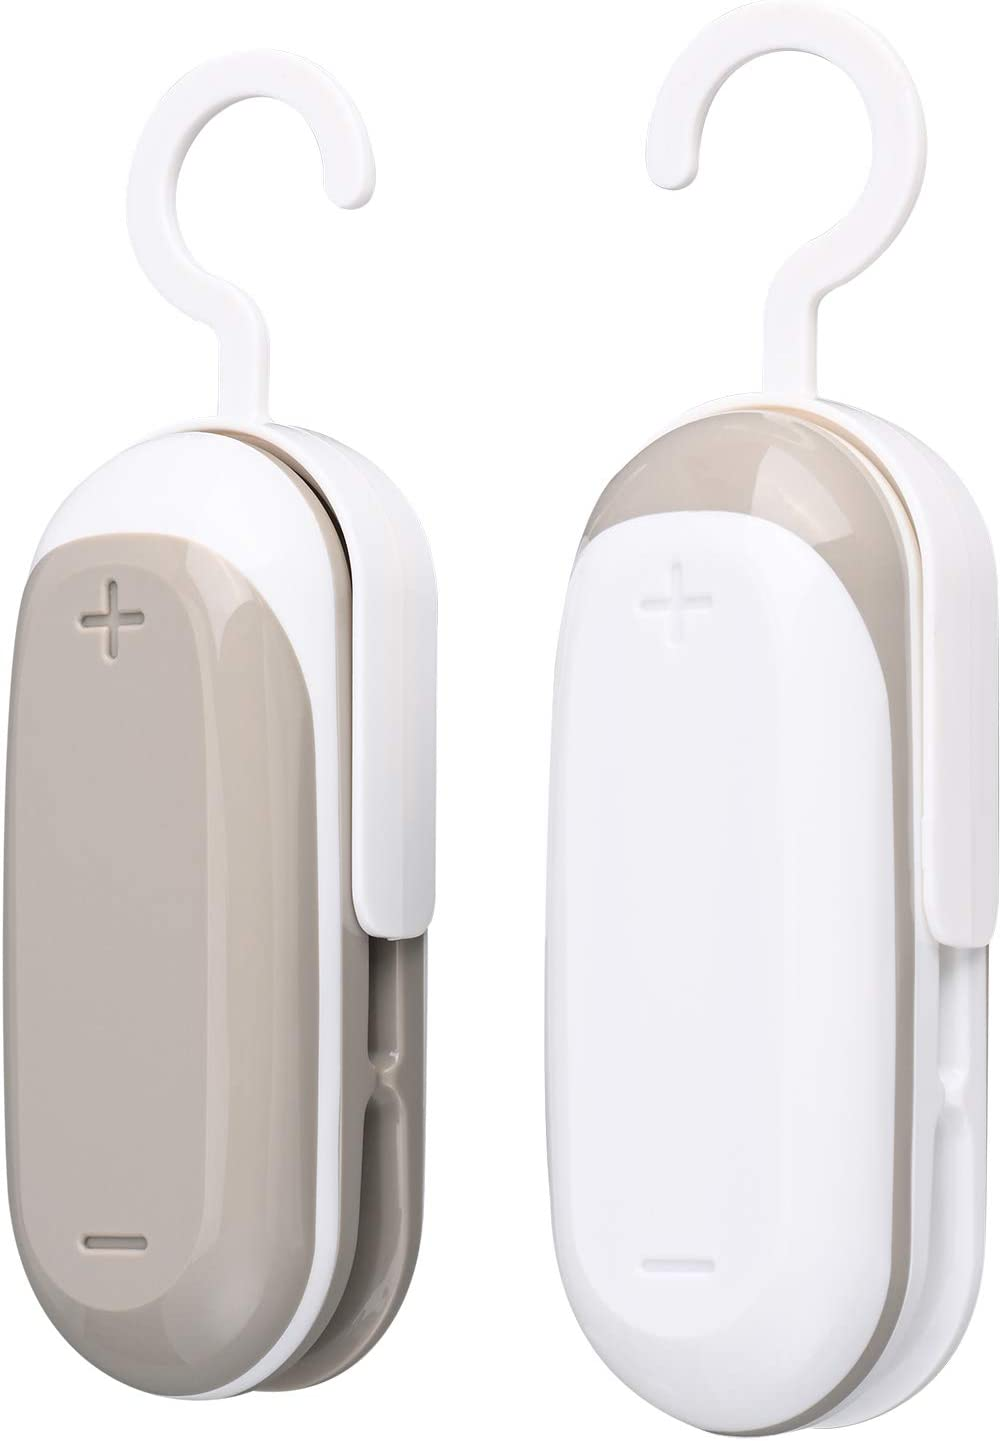 Jsdoin Mini Bag Sealer, 2PACK Portable Heat Vacuum Sealers Plastic Sealer, 2 in 1 Heat Seal and Food Storage Snack Fresh For Plastic Bags Food Storage